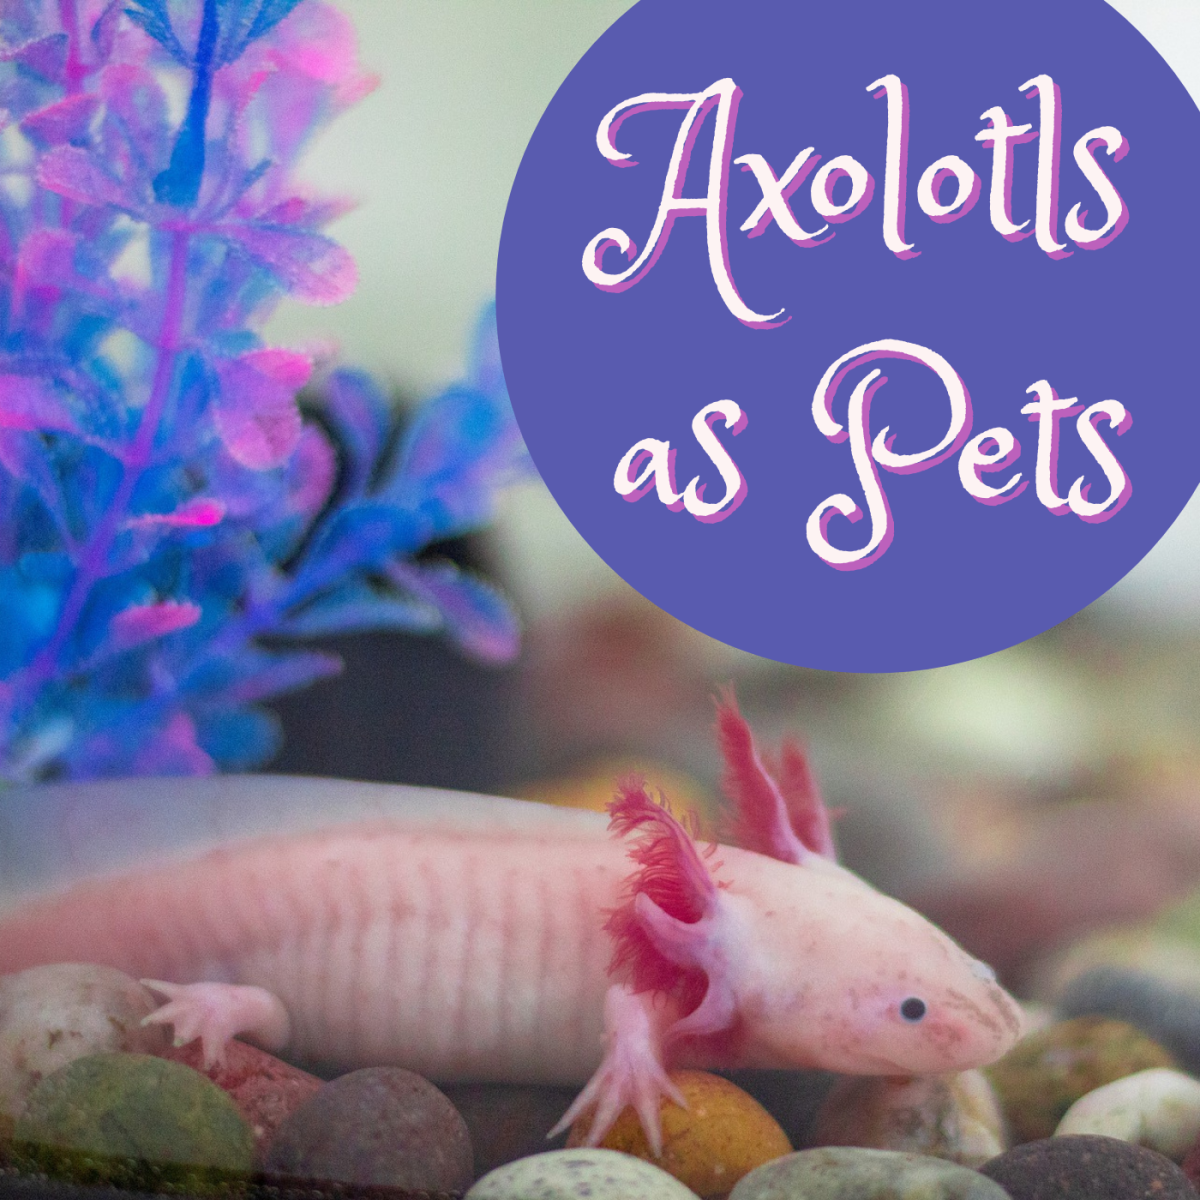 Get all the facts about keeping a pet axolotl. This photo shows an albino axolotl.